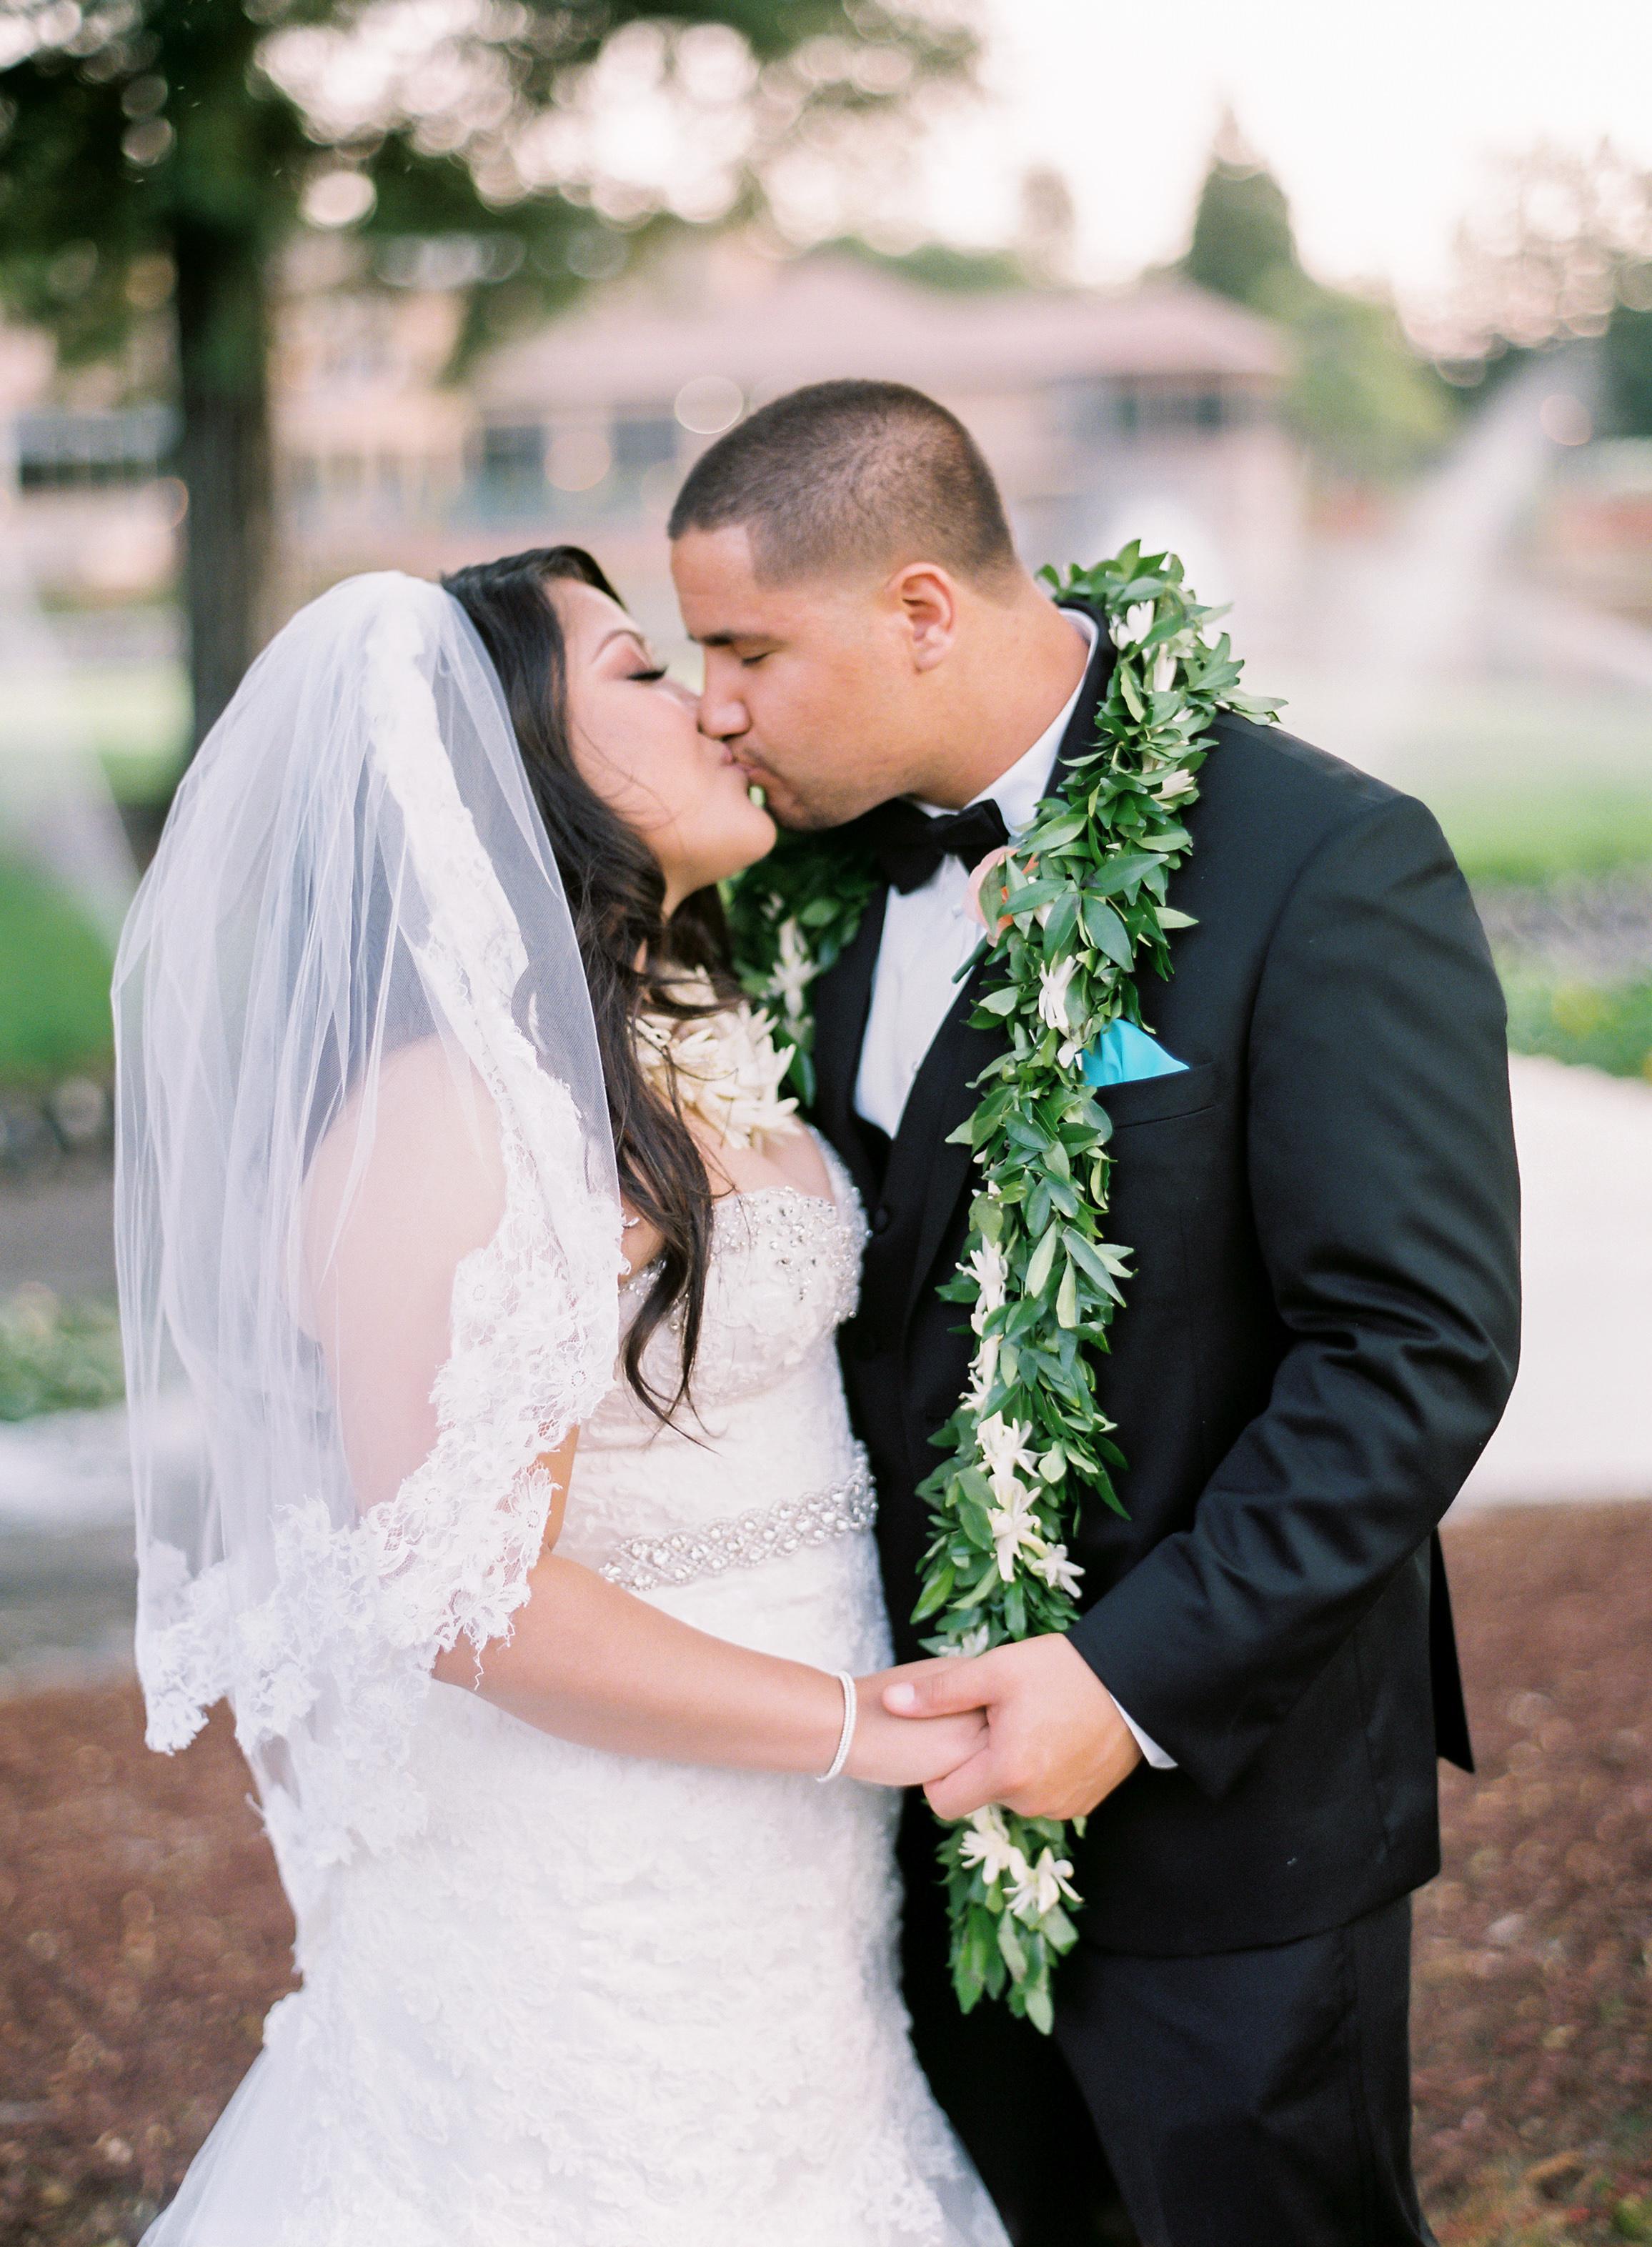 hawaiian-inspired-wedding-at-blackhawk-country-club-016.jpg